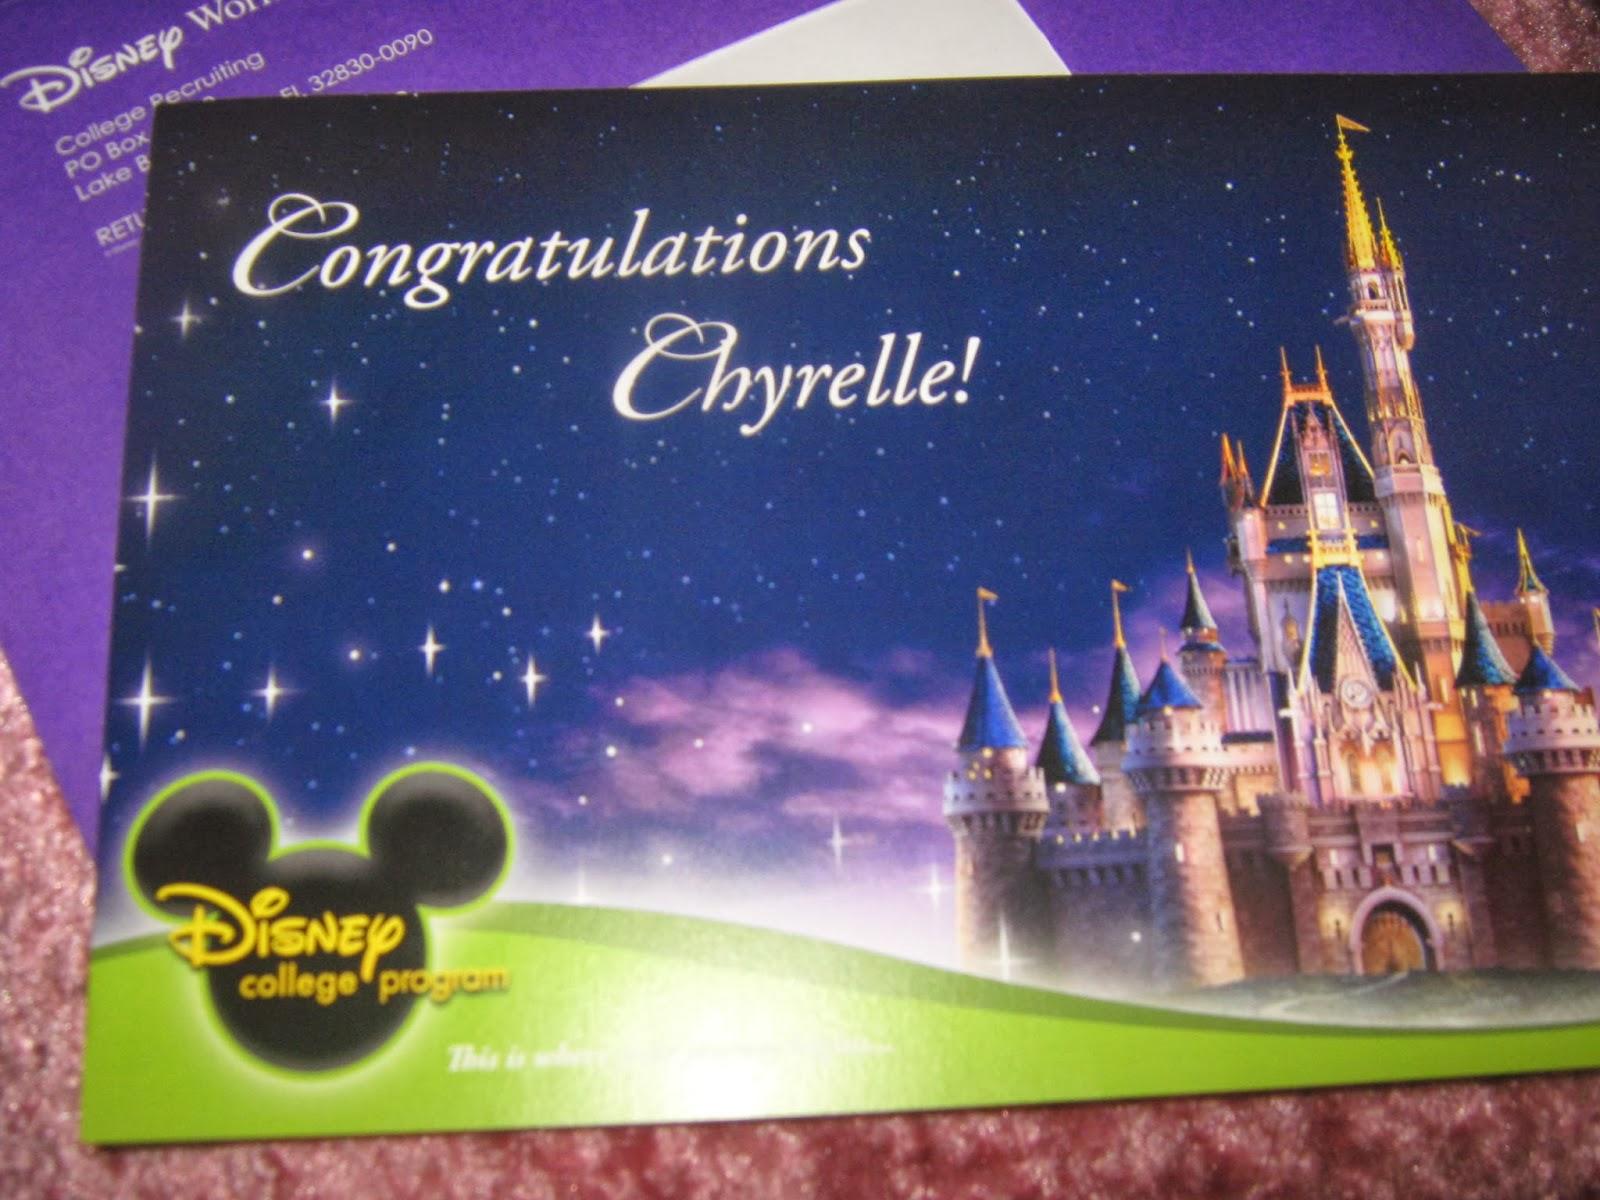 Disney College Program Postcard